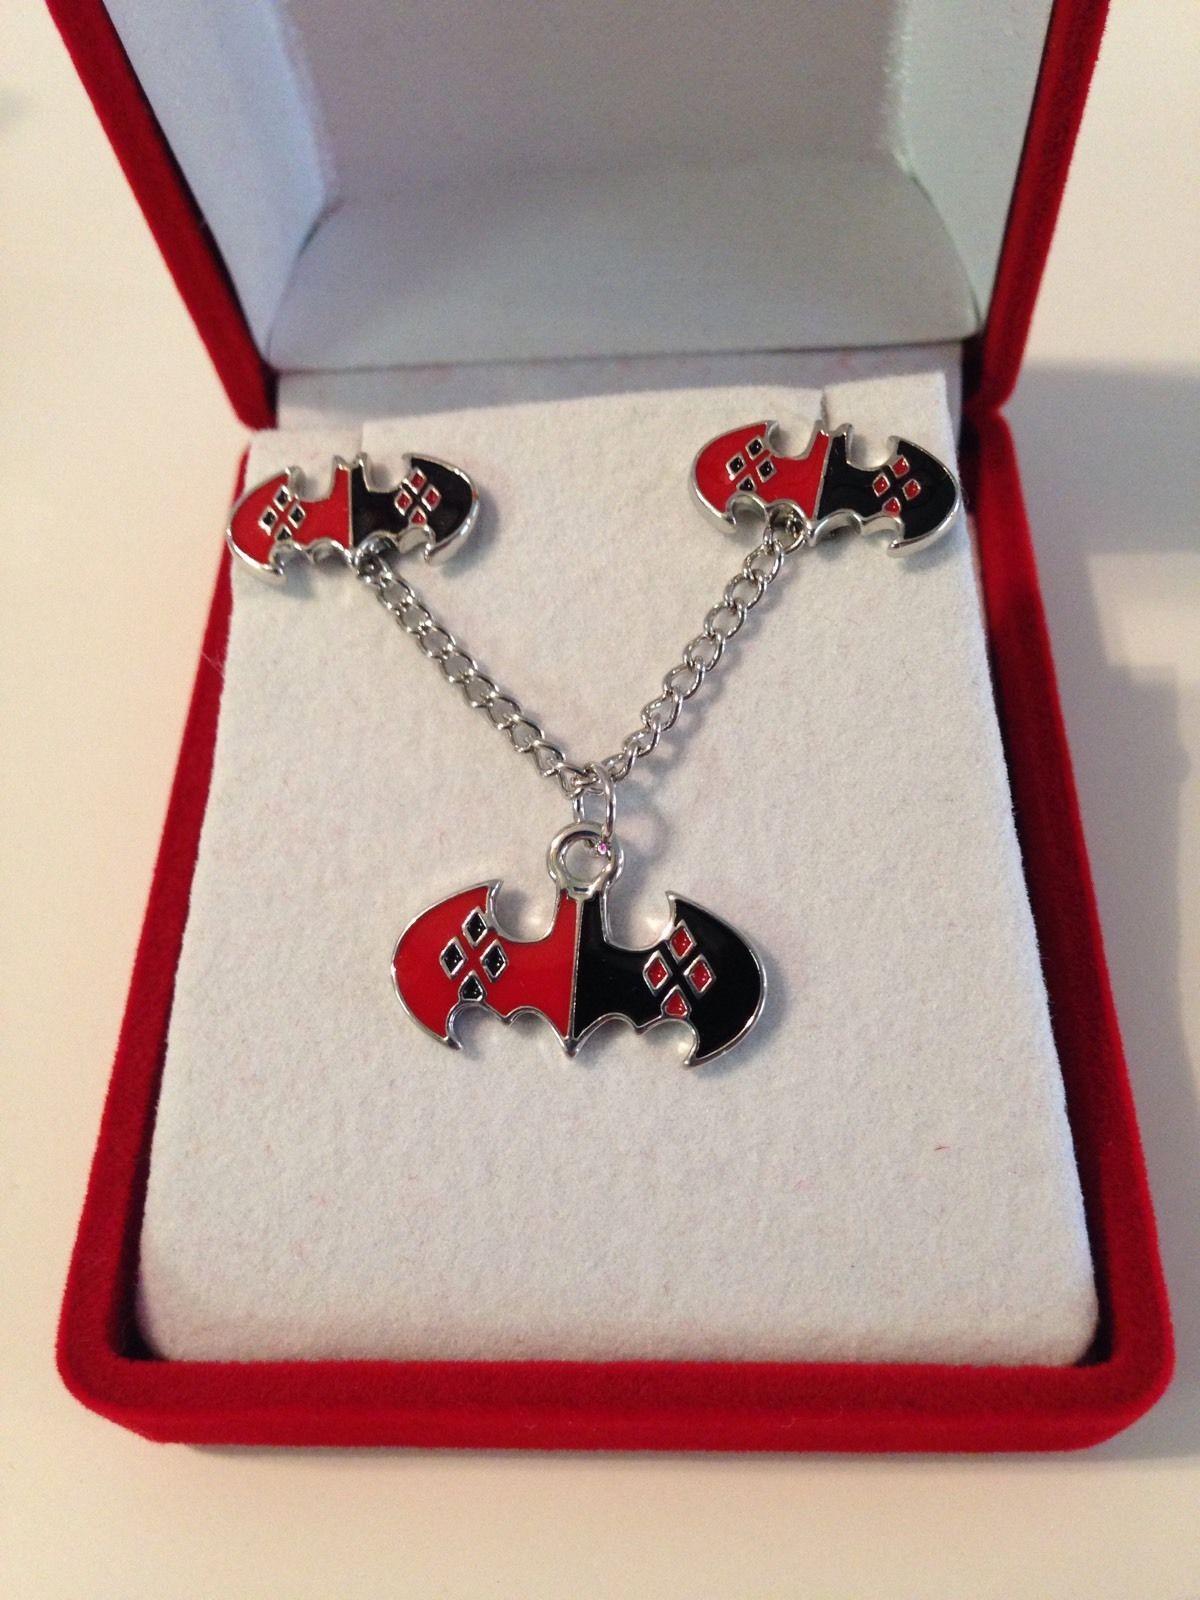 Batman harley quinn earrings necklace set christmas ebay dp u hq